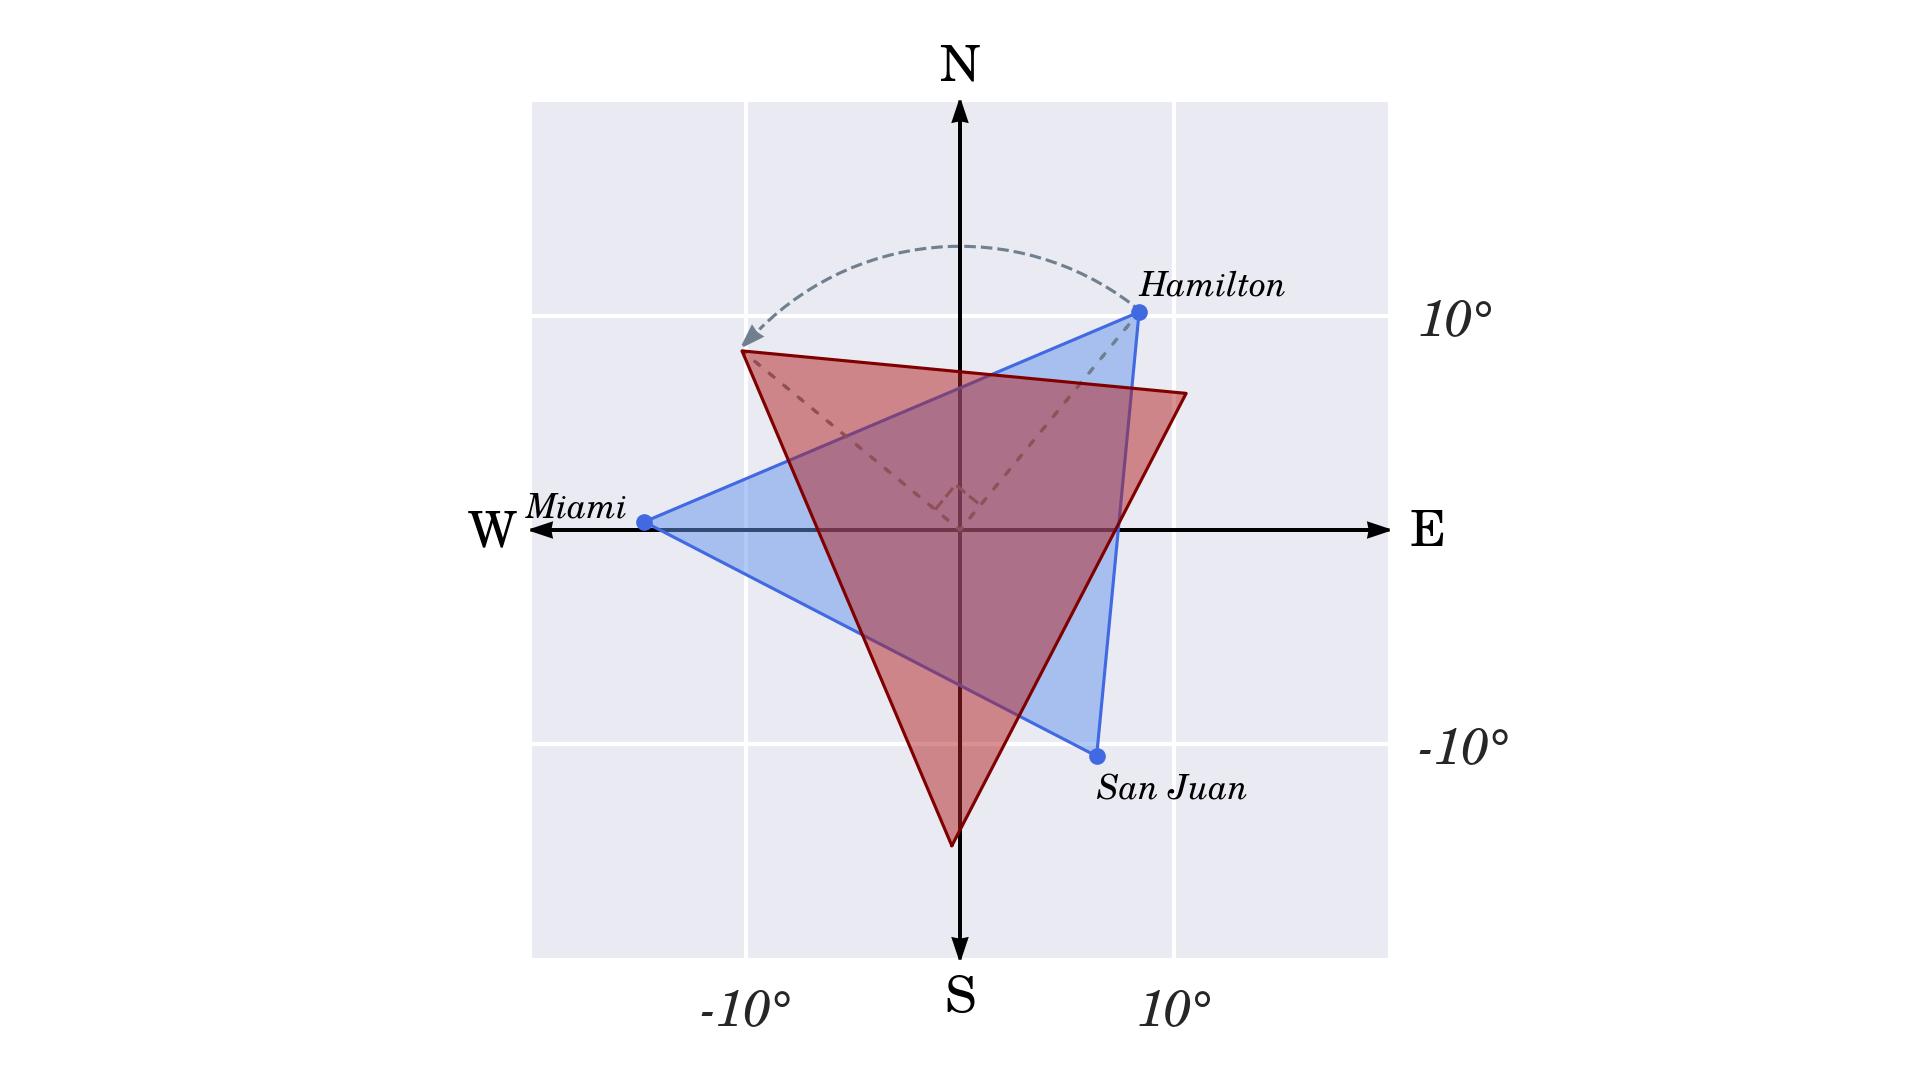 Rotation of the Bermuda Triangle